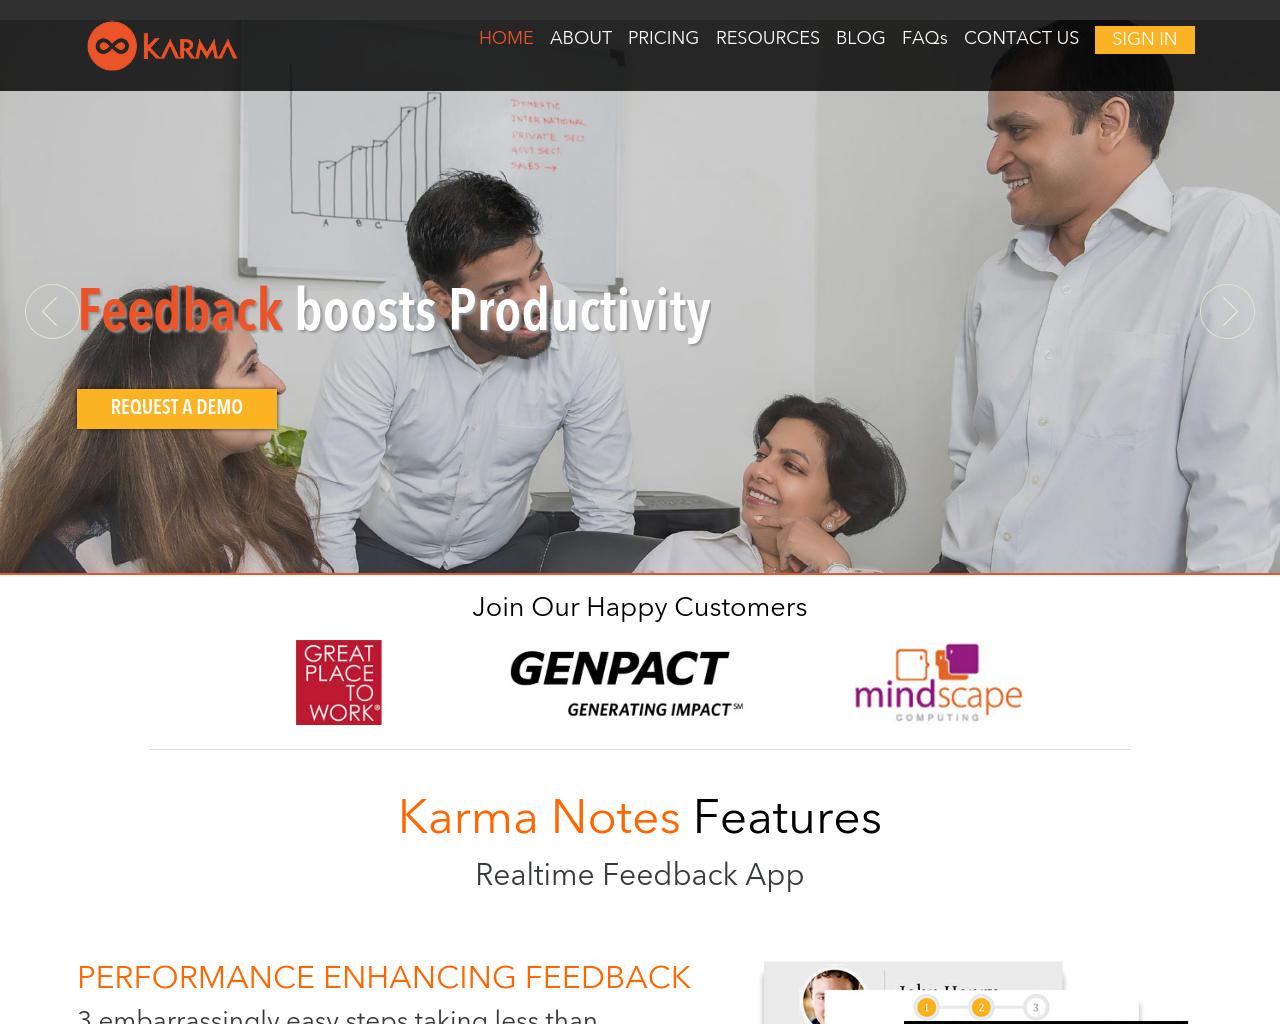 Karma-Feedback-Advertising-Reviews-Pricing